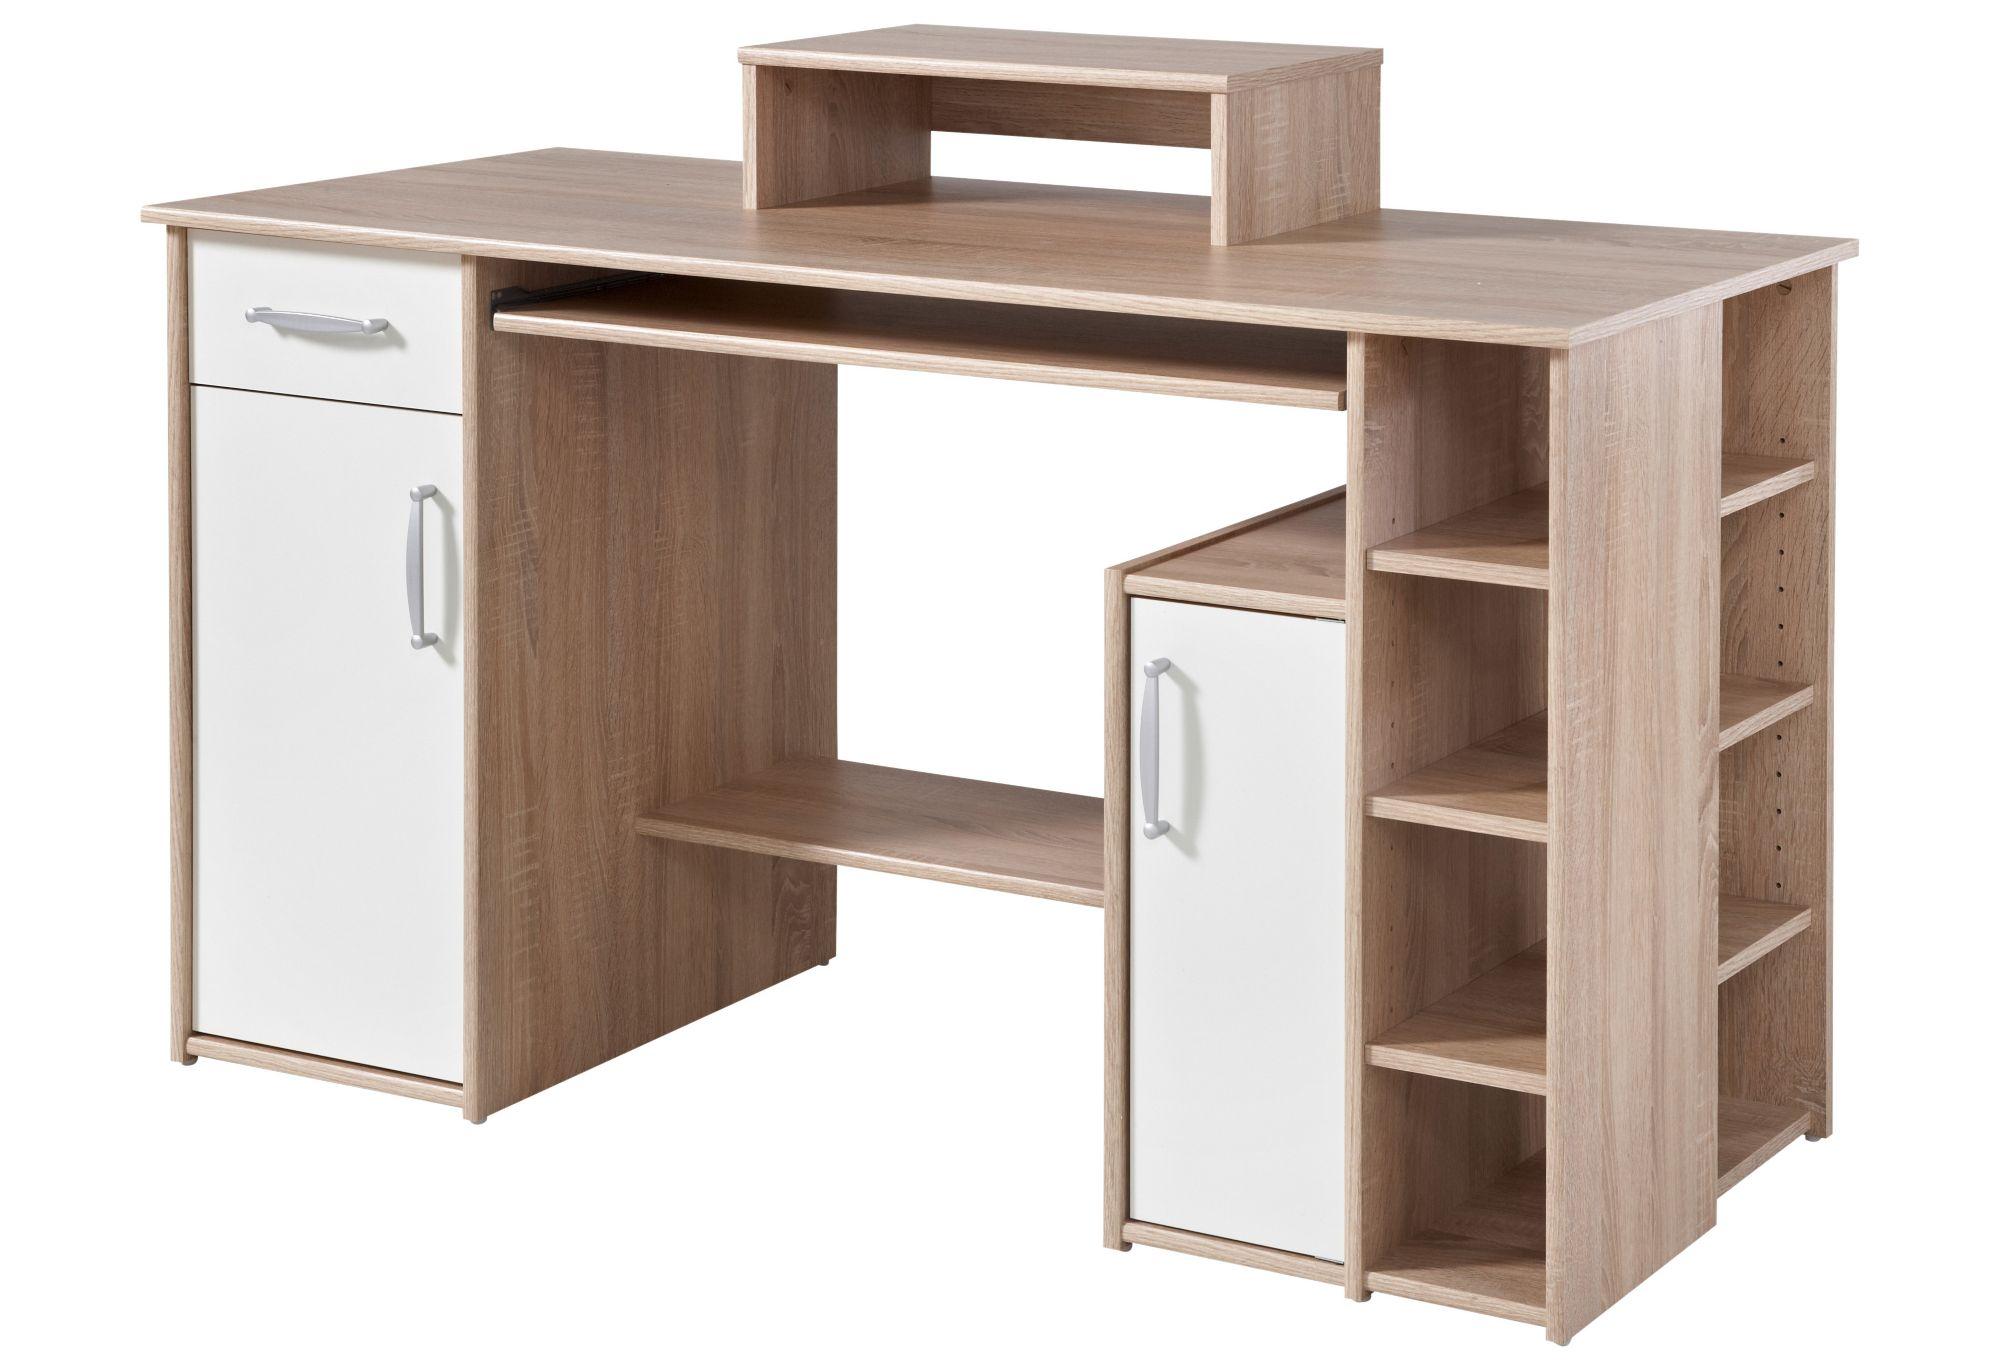 maja m bel schreibtisch main schwab versand. Black Bedroom Furniture Sets. Home Design Ideas